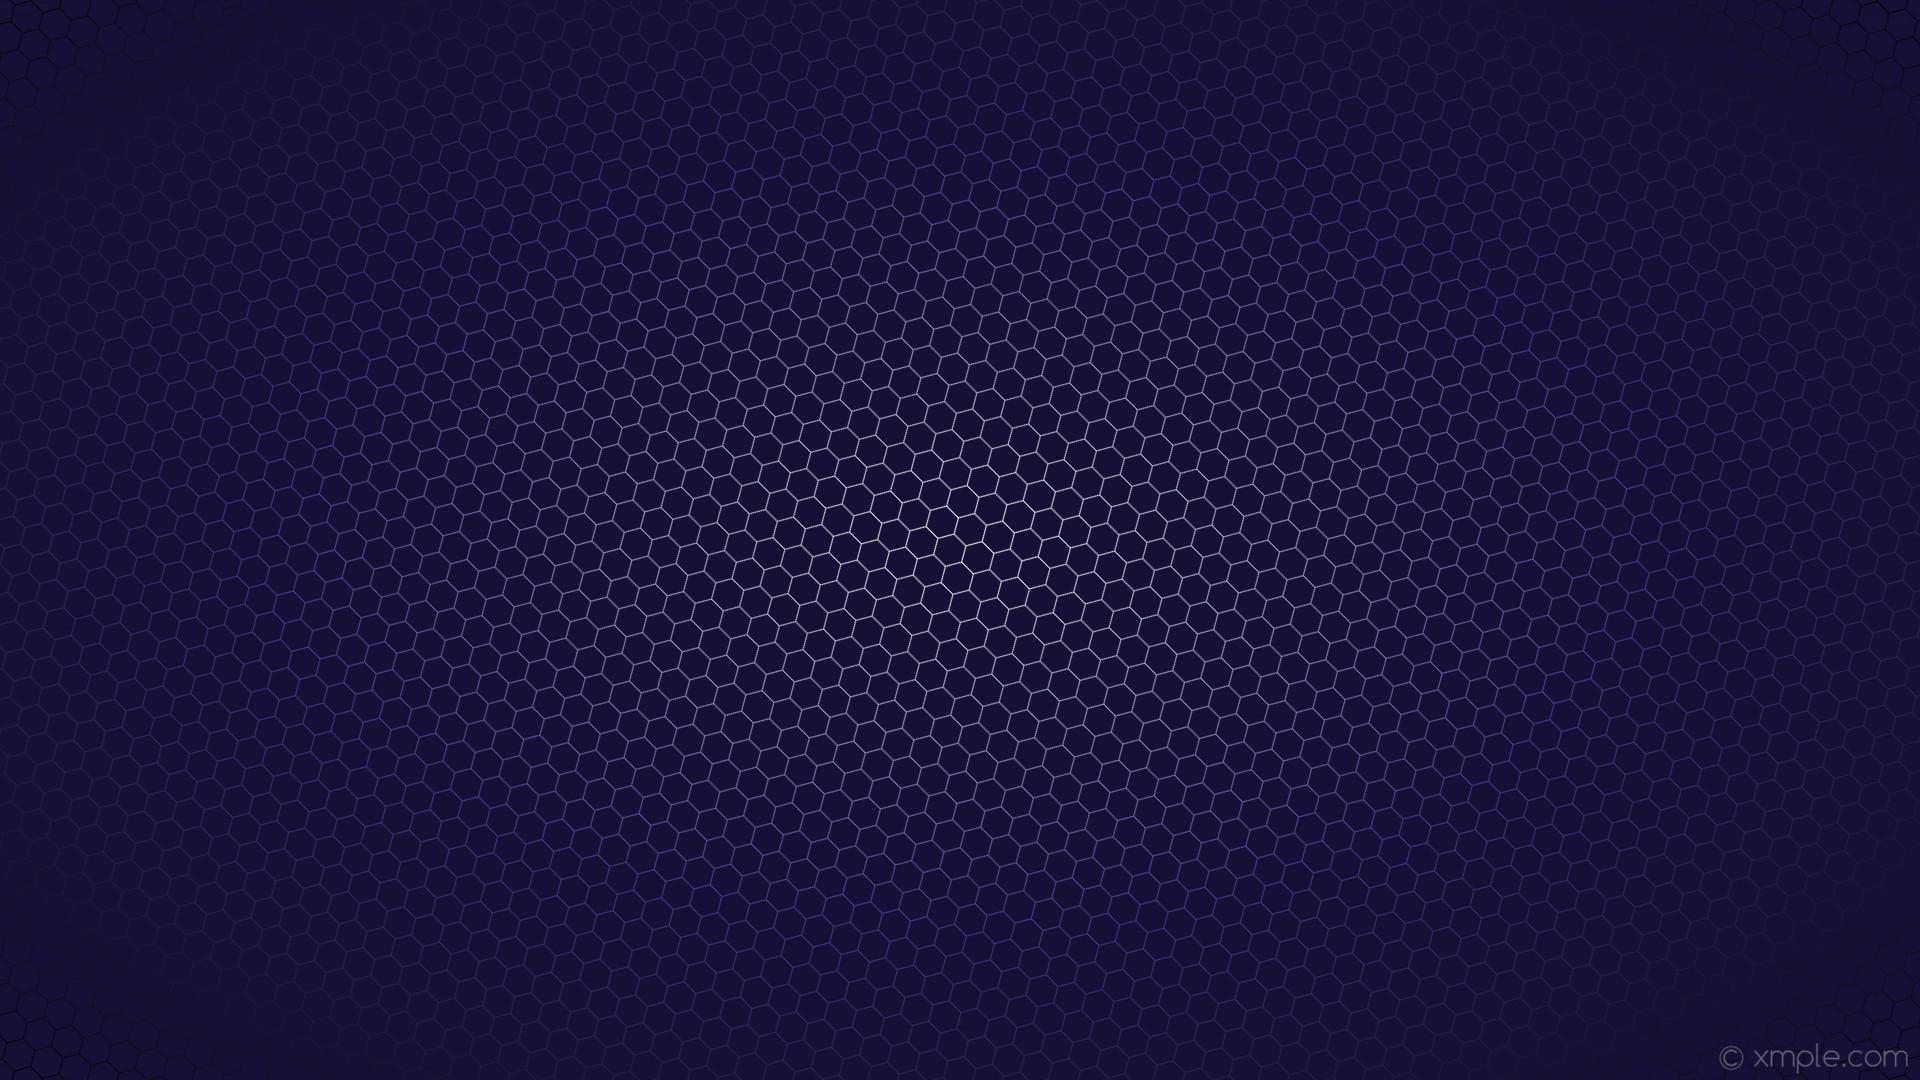 wallpaper blue hexagon gradient purple white glow black dark blue dark  slate blue #171036 #